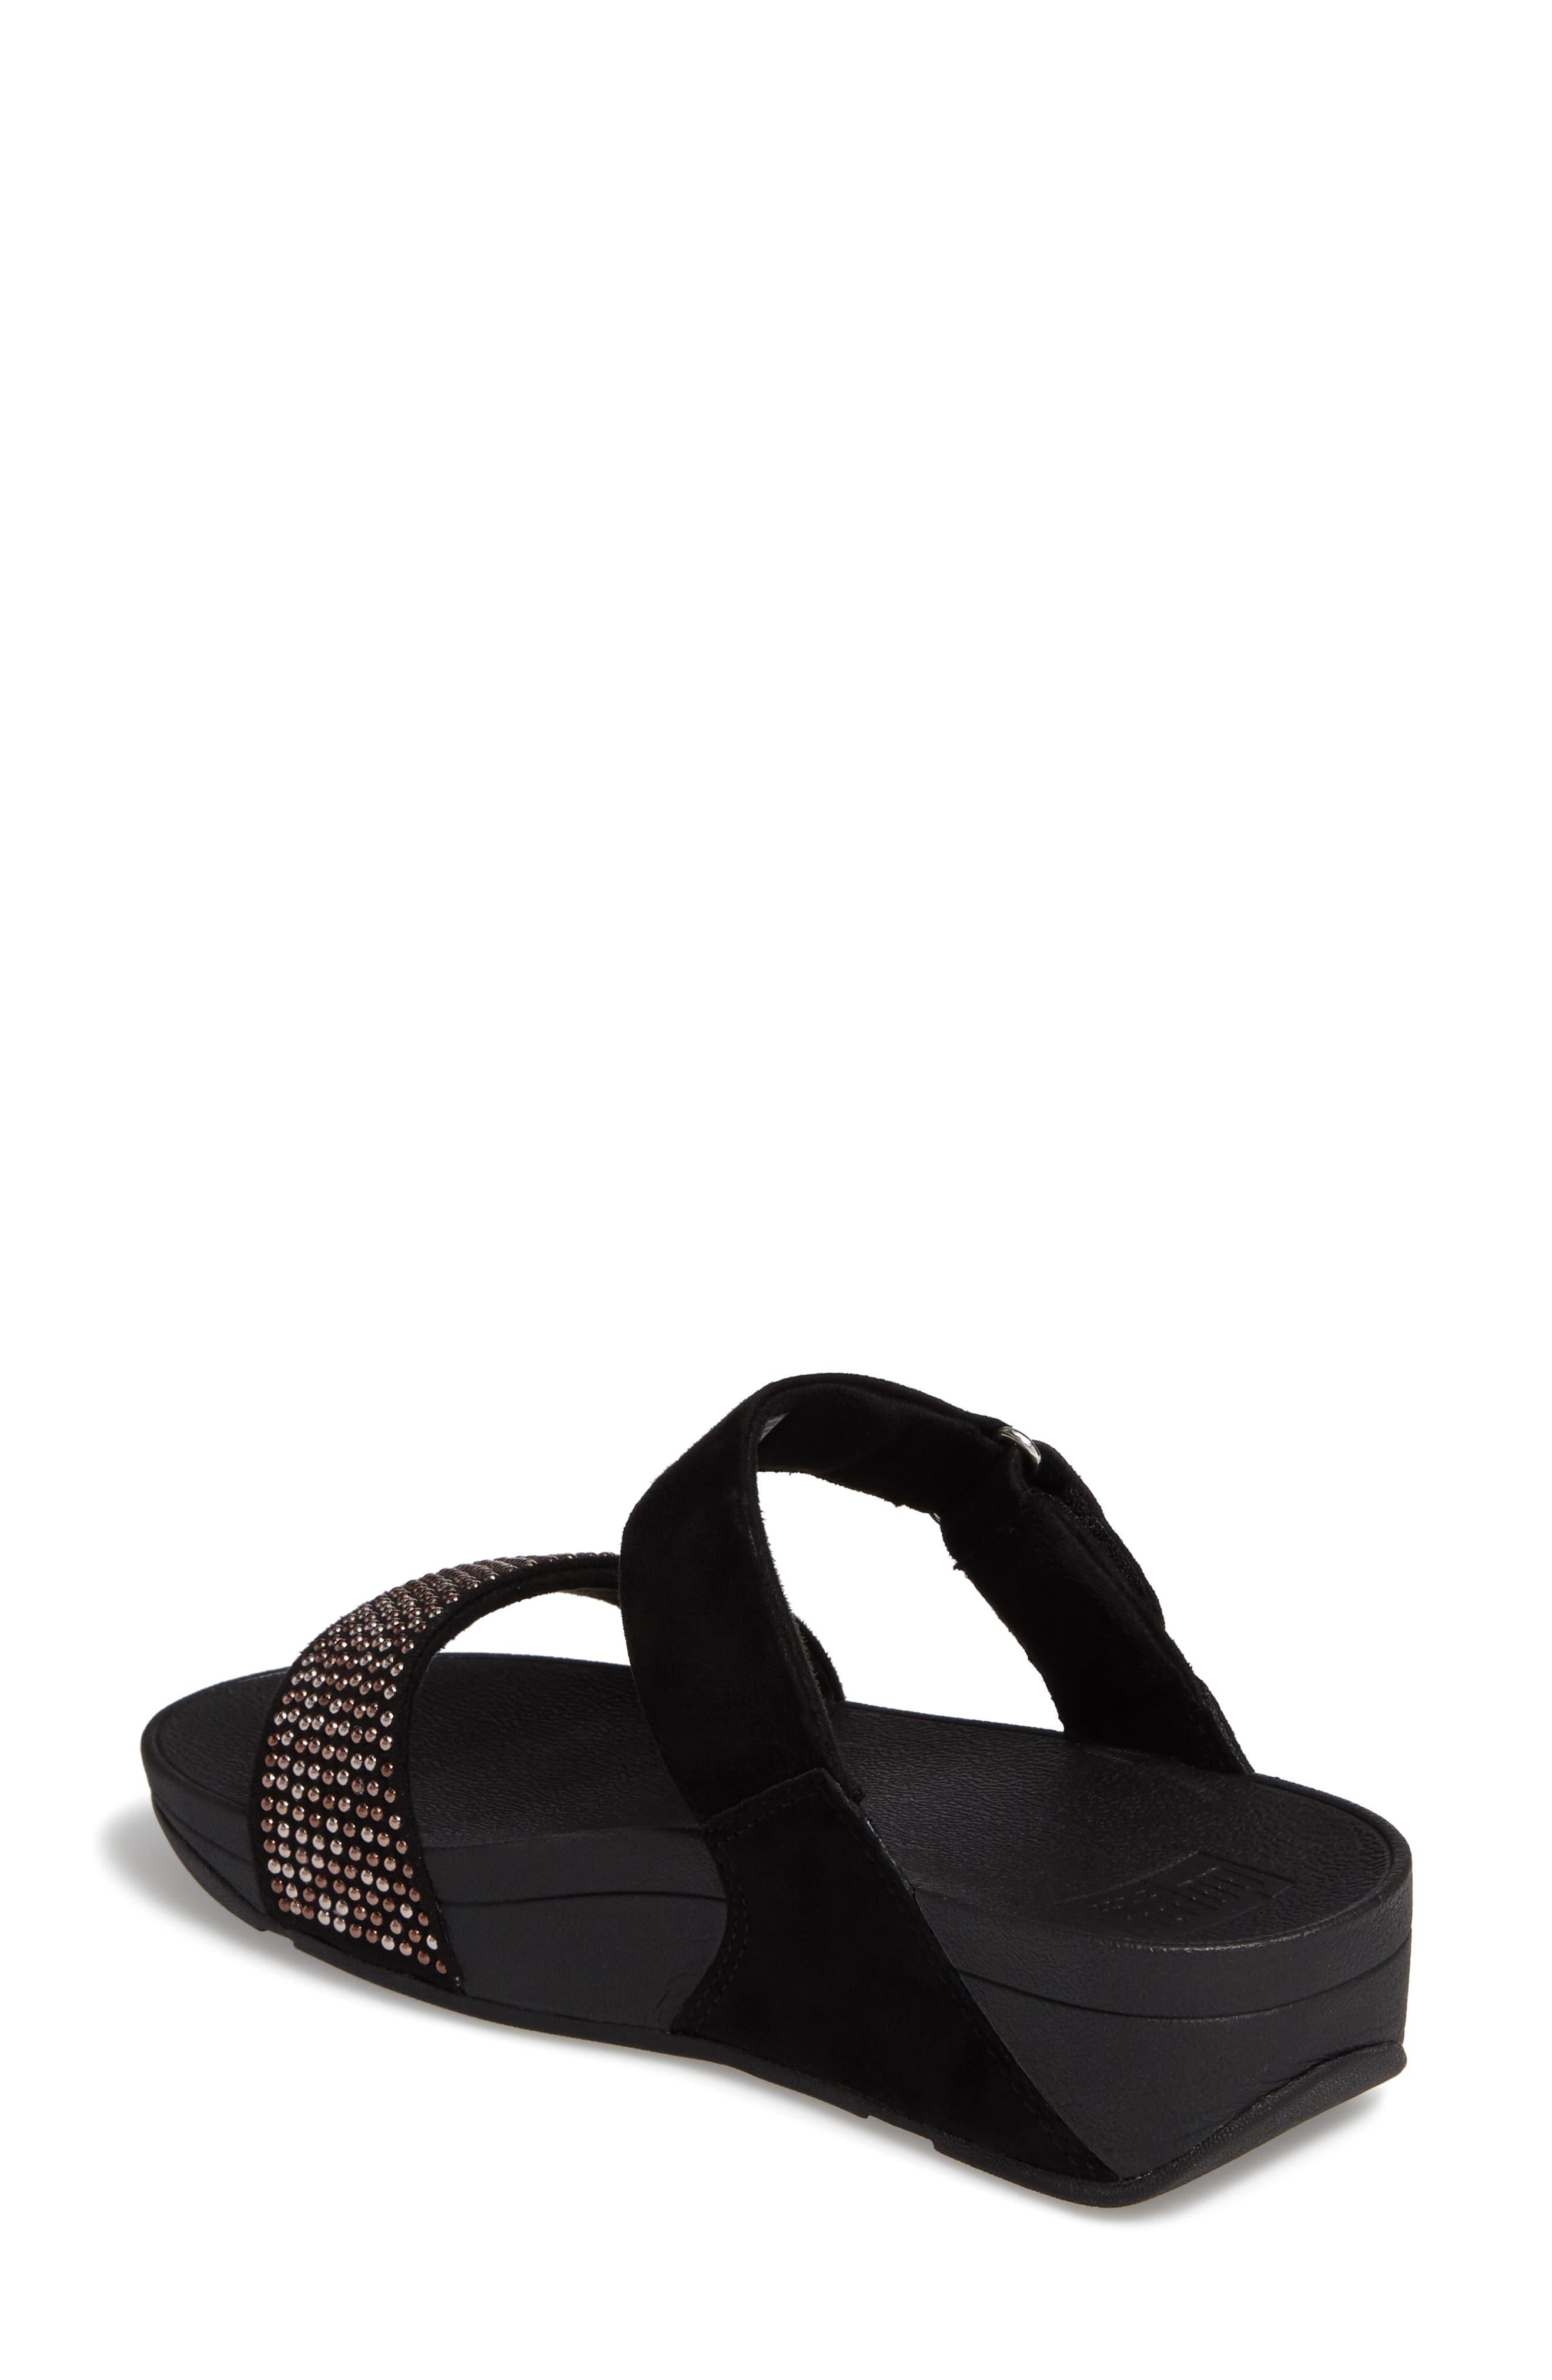 Lulu Popstud Wedge Slide Sandal,                             Alternate thumbnail 2, color,                             Black Fabric